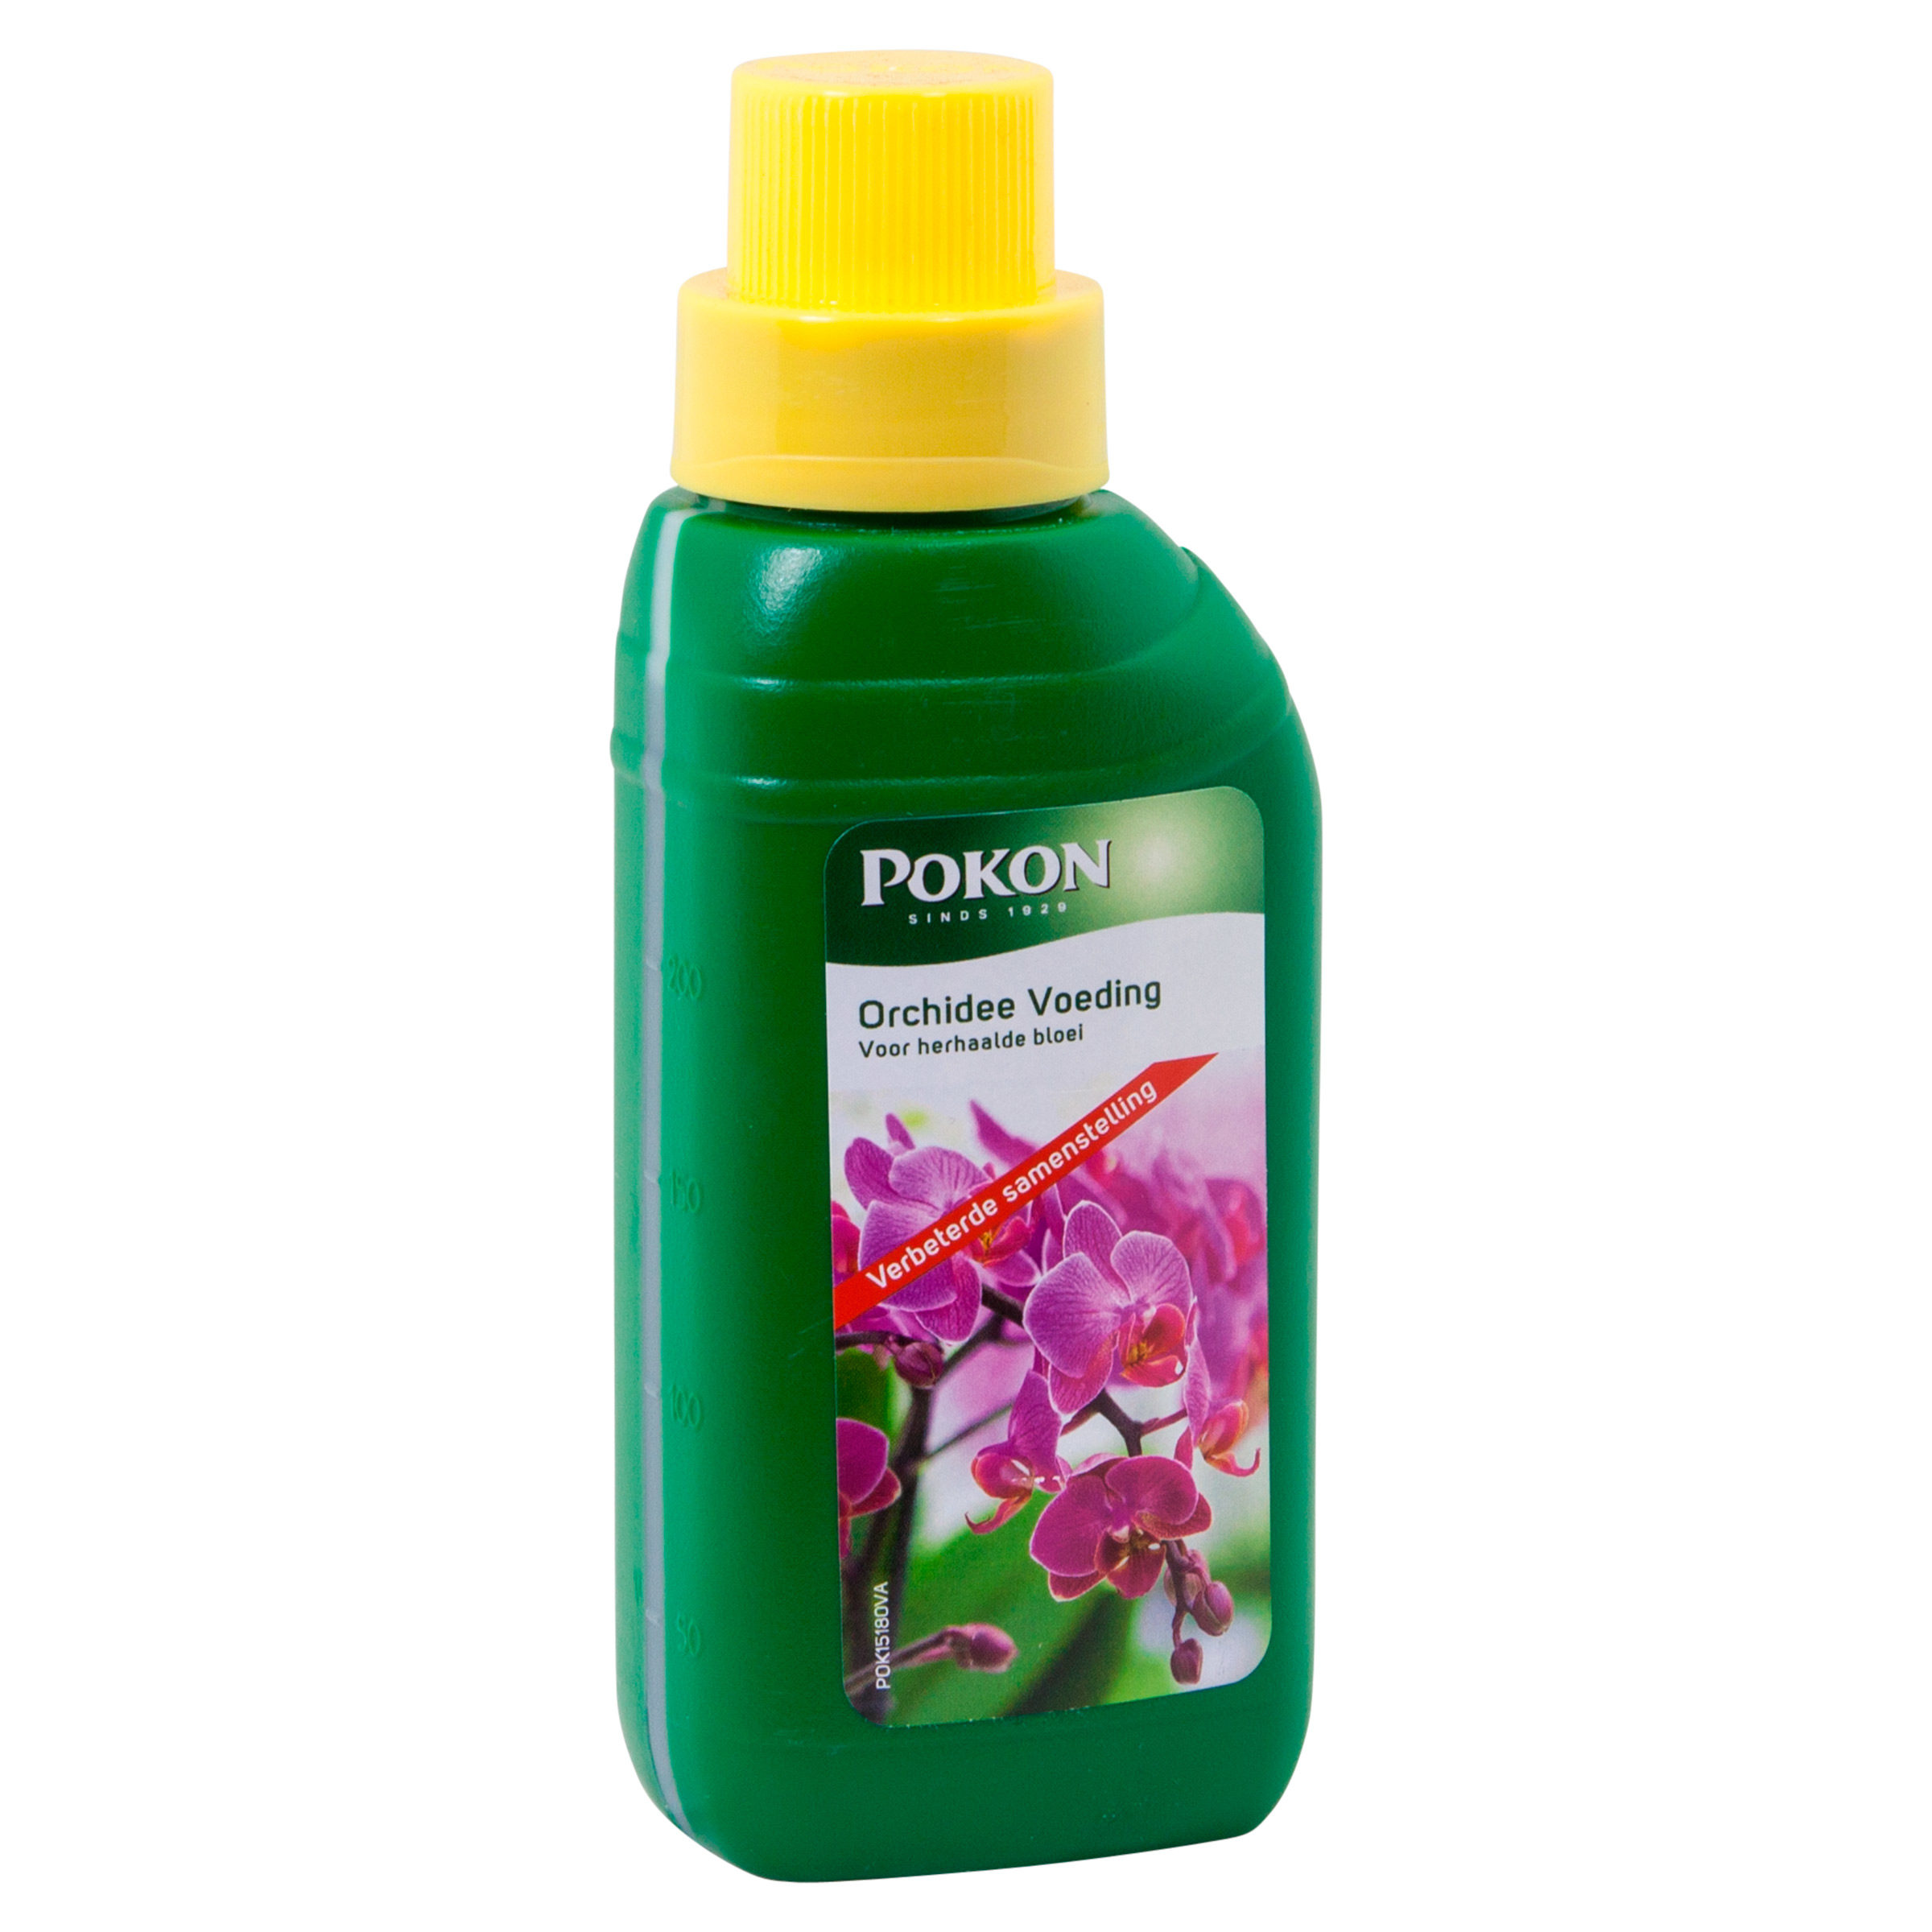 Pokon Orchidee Voeding 250ml